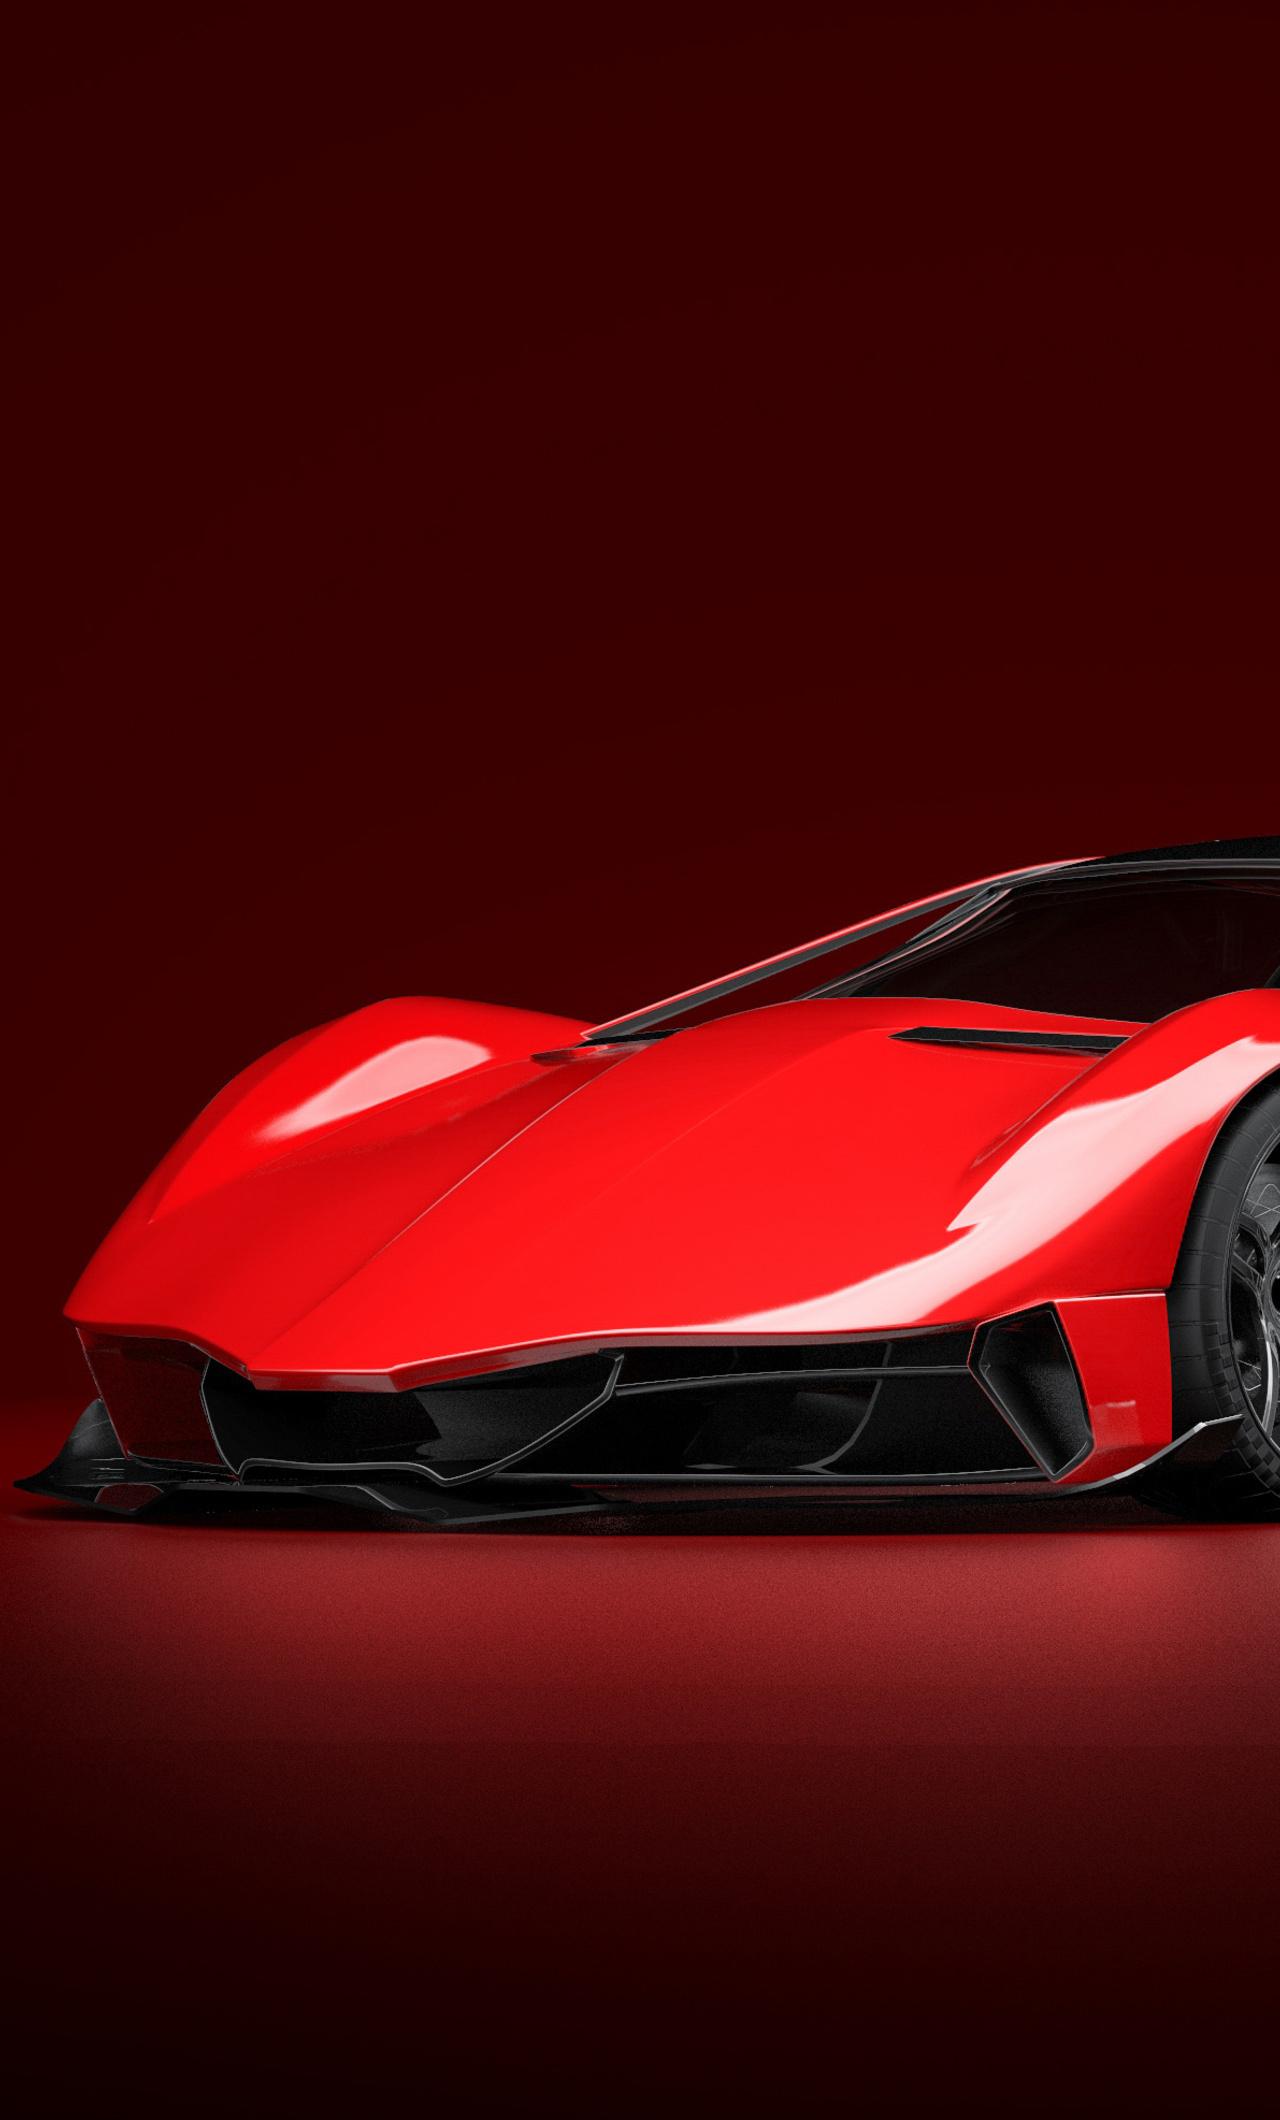 1280x2120 Lamborghini Countach 4k Iphone 6 Hd 4k Wallpapers Images